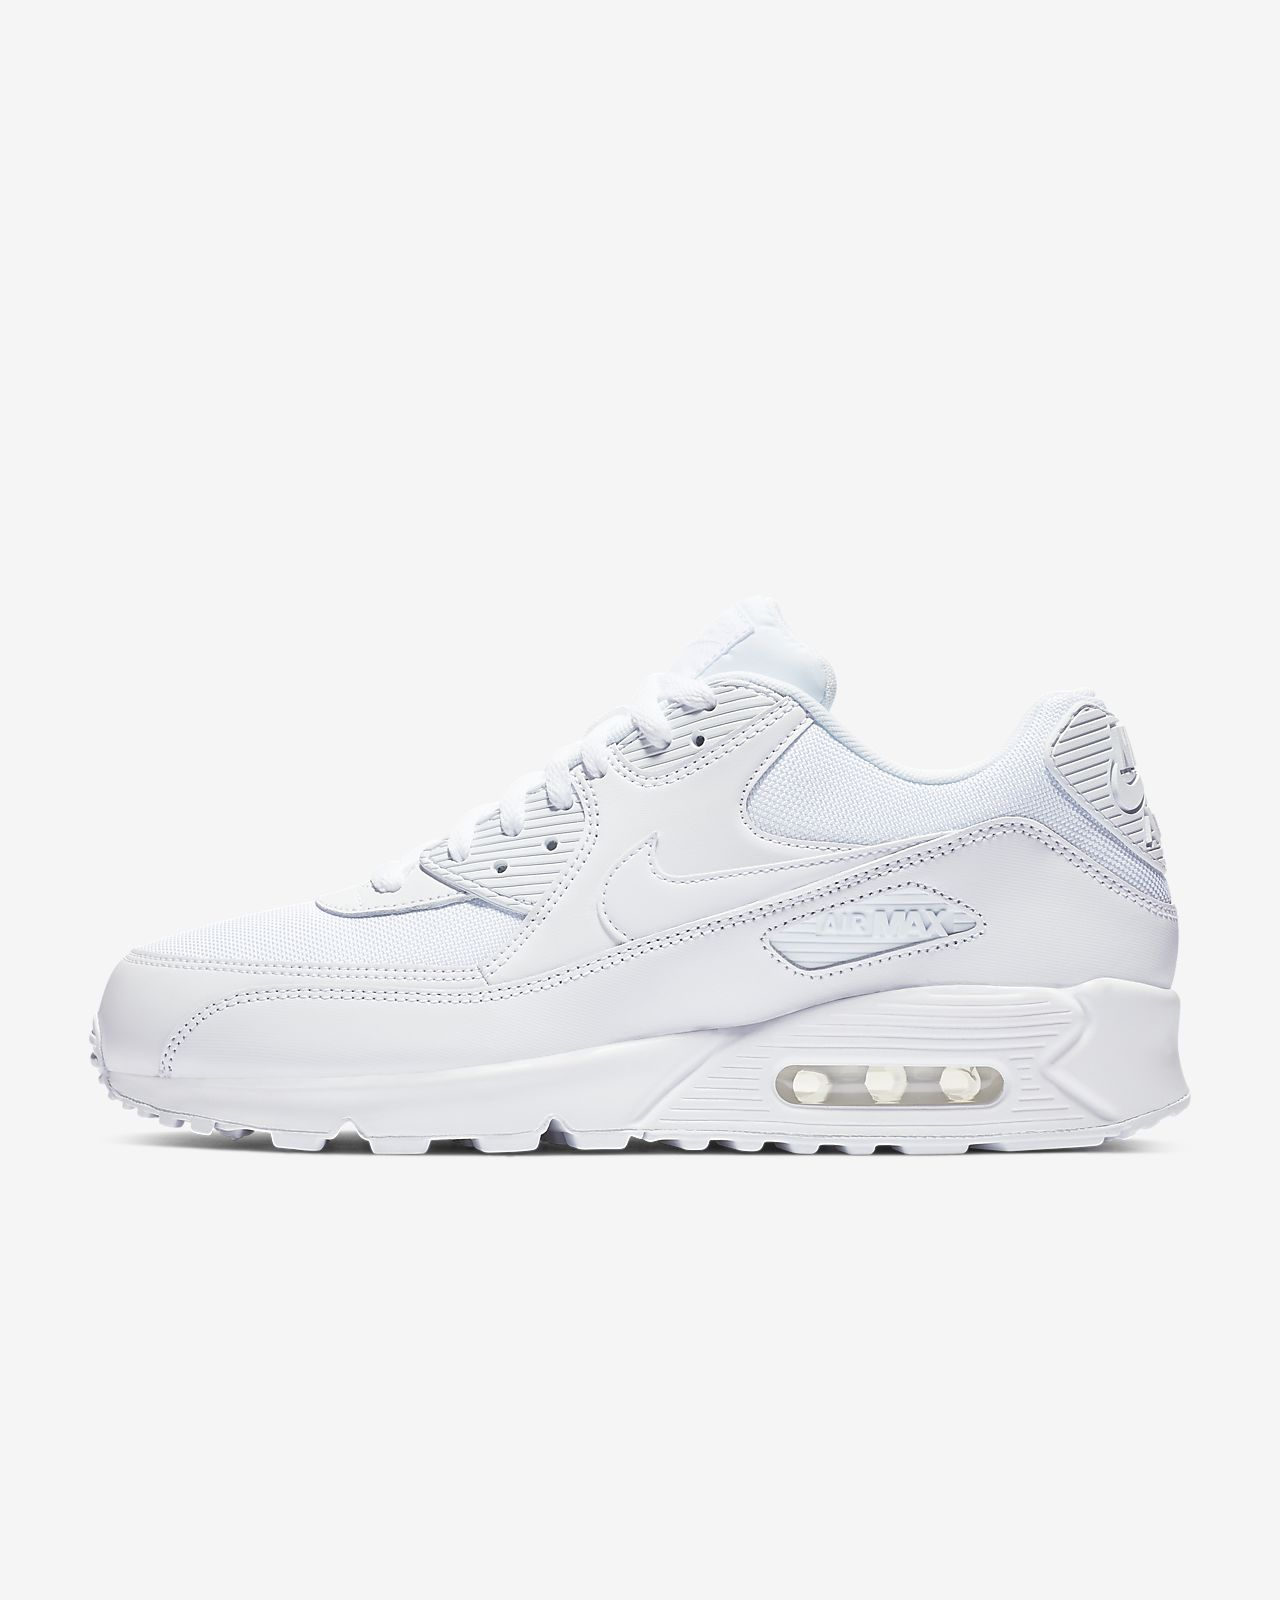 best sneakers f37d5 f0a4c รองเท้าผู้ชาย Nike Air Max 90 Essential